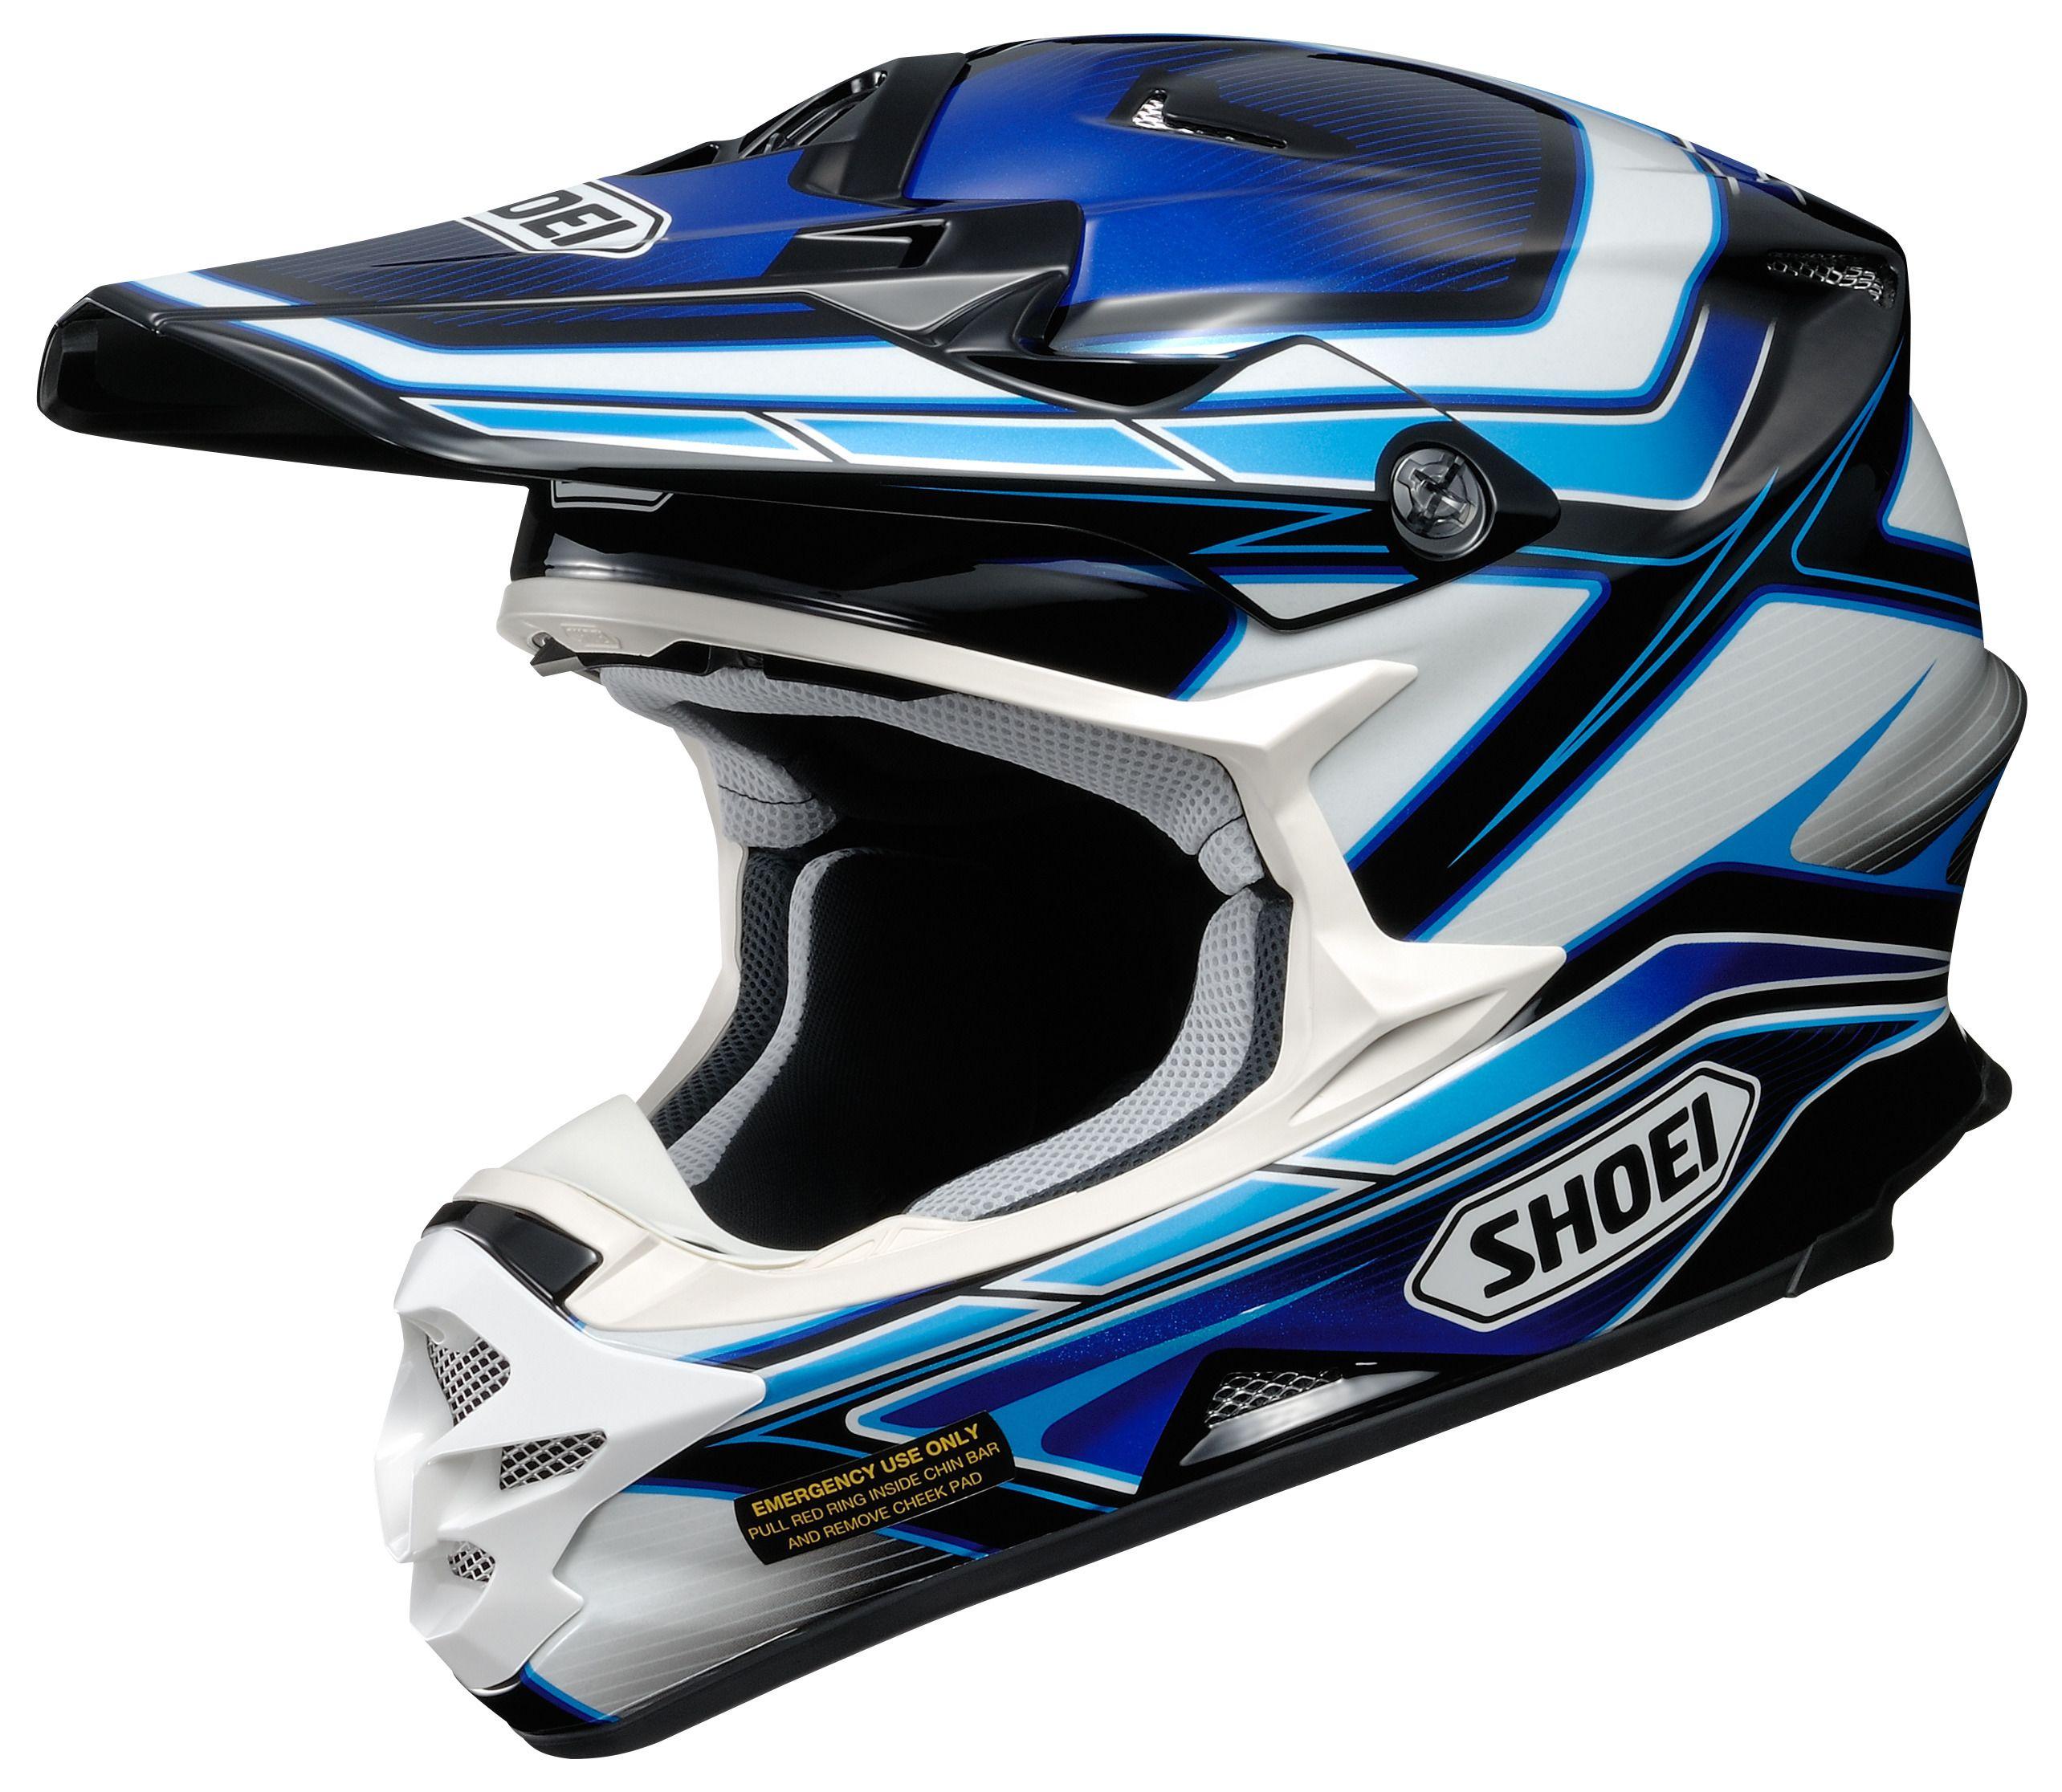 shoei vfx w capacitor helmet 20 off revzilla. Black Bedroom Furniture Sets. Home Design Ideas